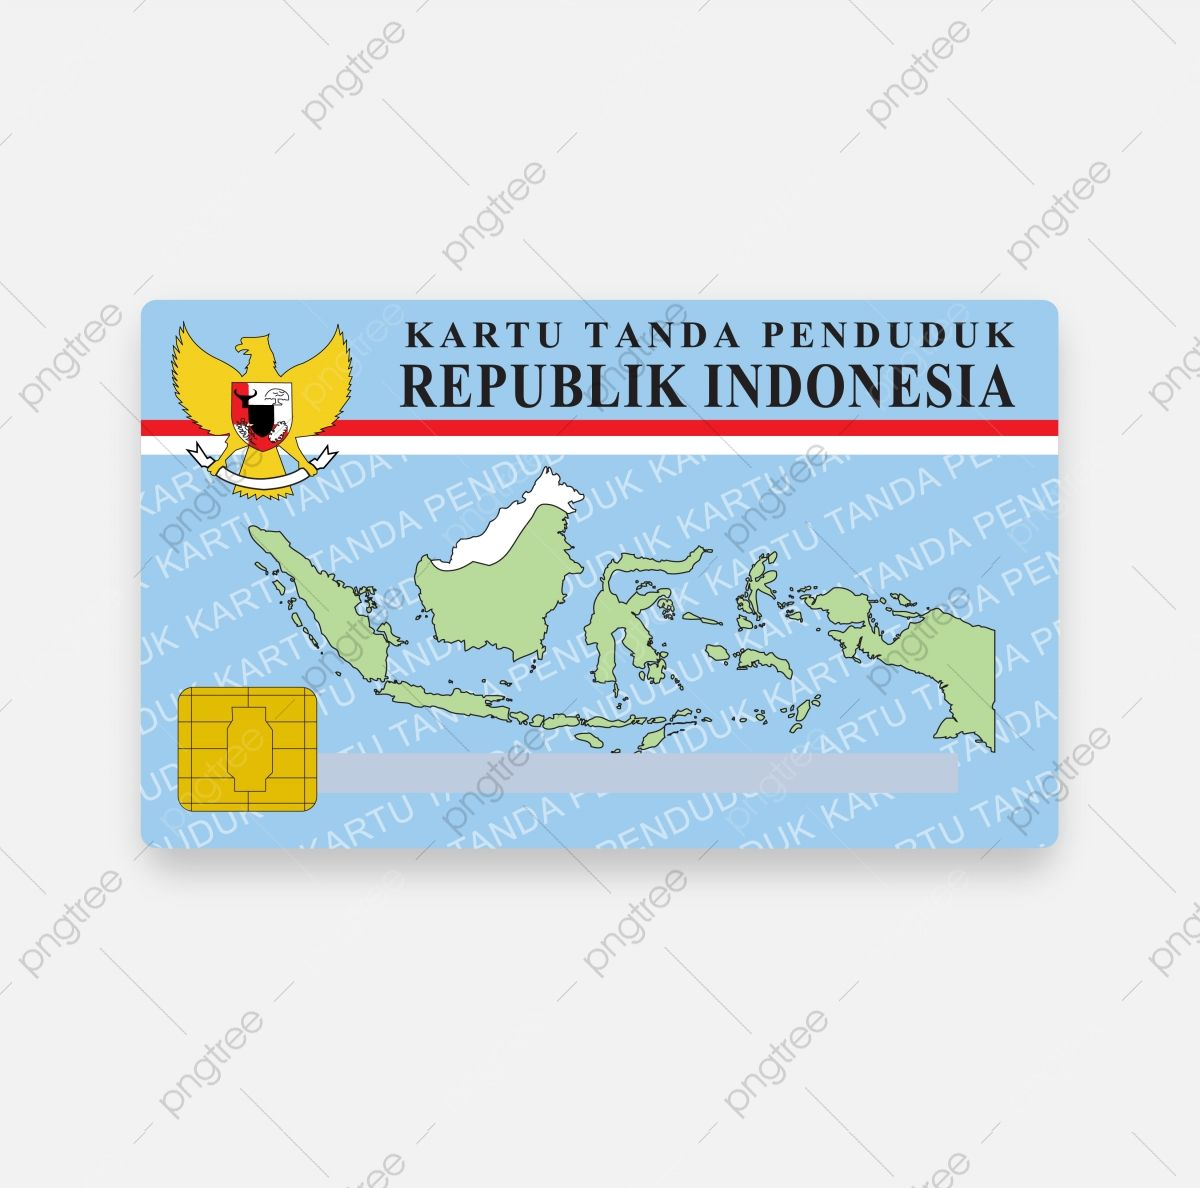 Ktp Indonesia E Ktp Id Card in 2020 Logo design free